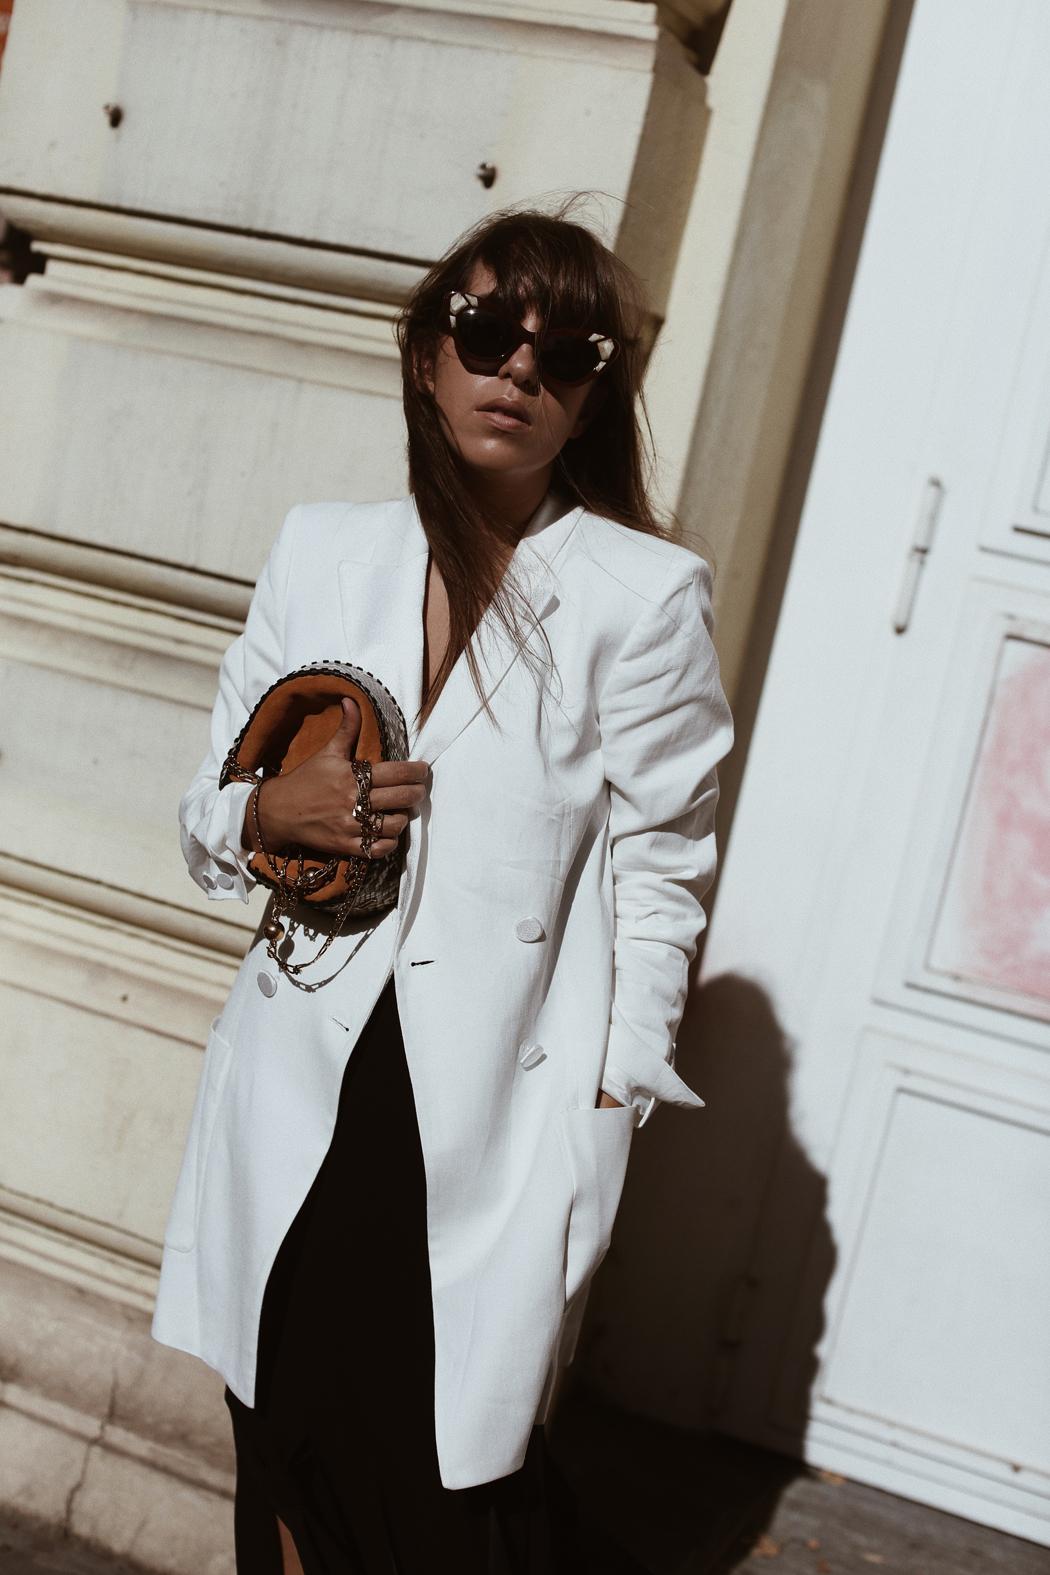 The Dashing Rider White Zara Blazer & Rejina Pyo Skirt